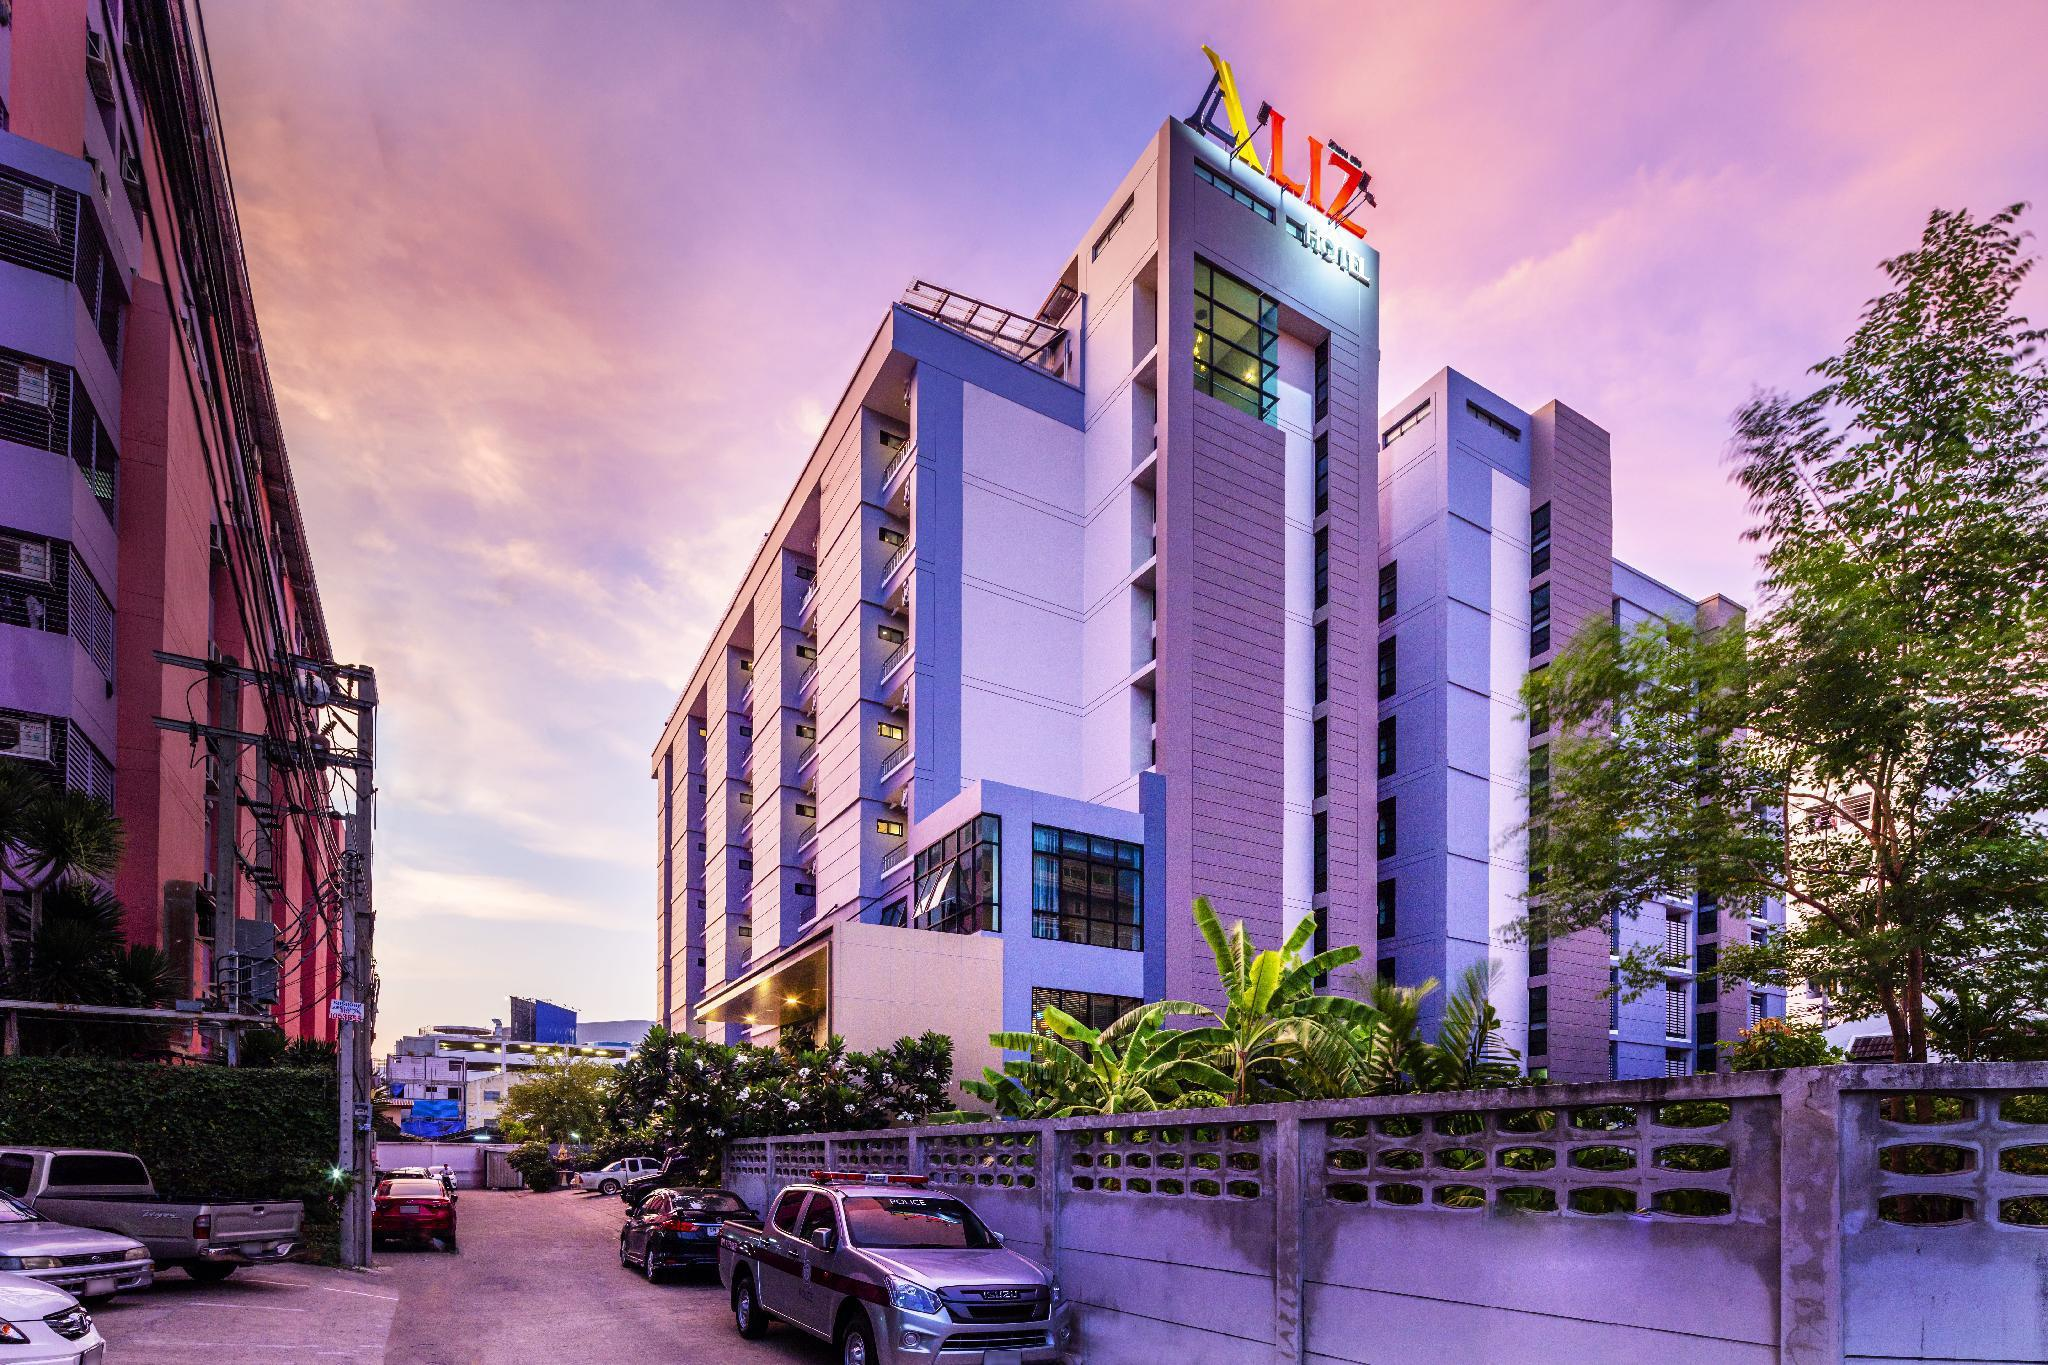 Aliz Hotel โรงแรมอลิซ